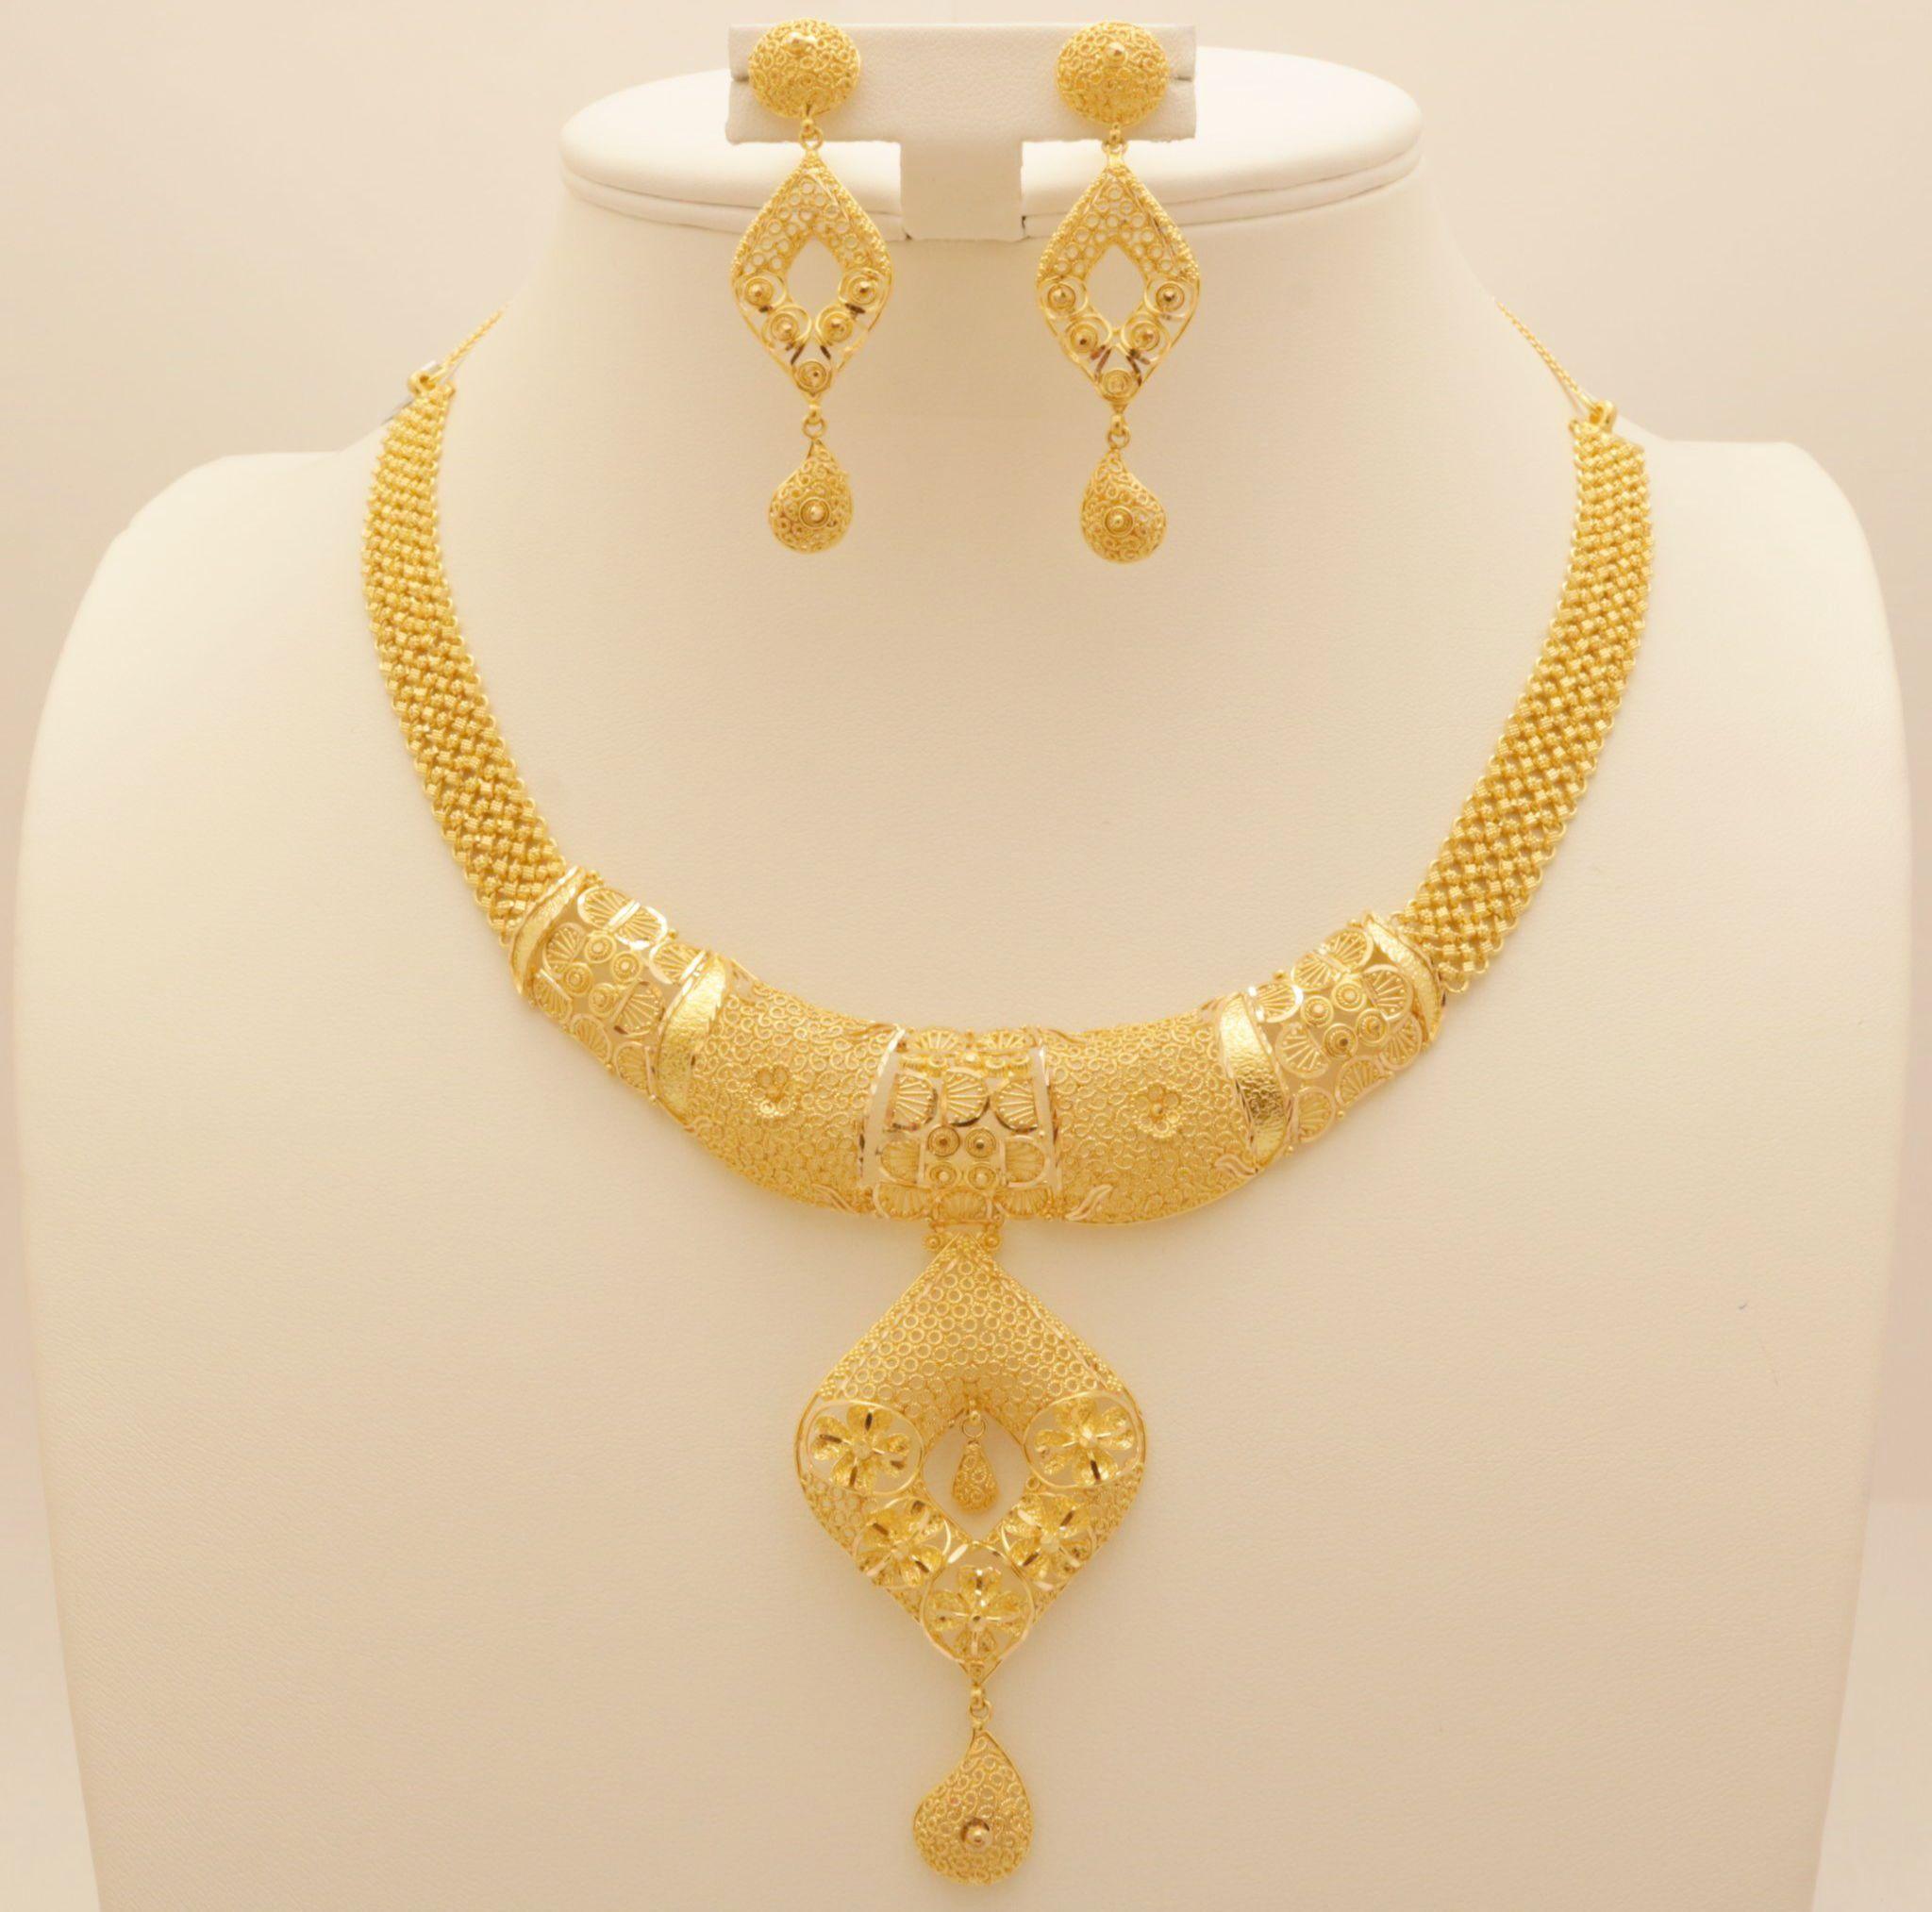 Reeds Jewelry Store Near Me below Gold Jewellery In Dubai